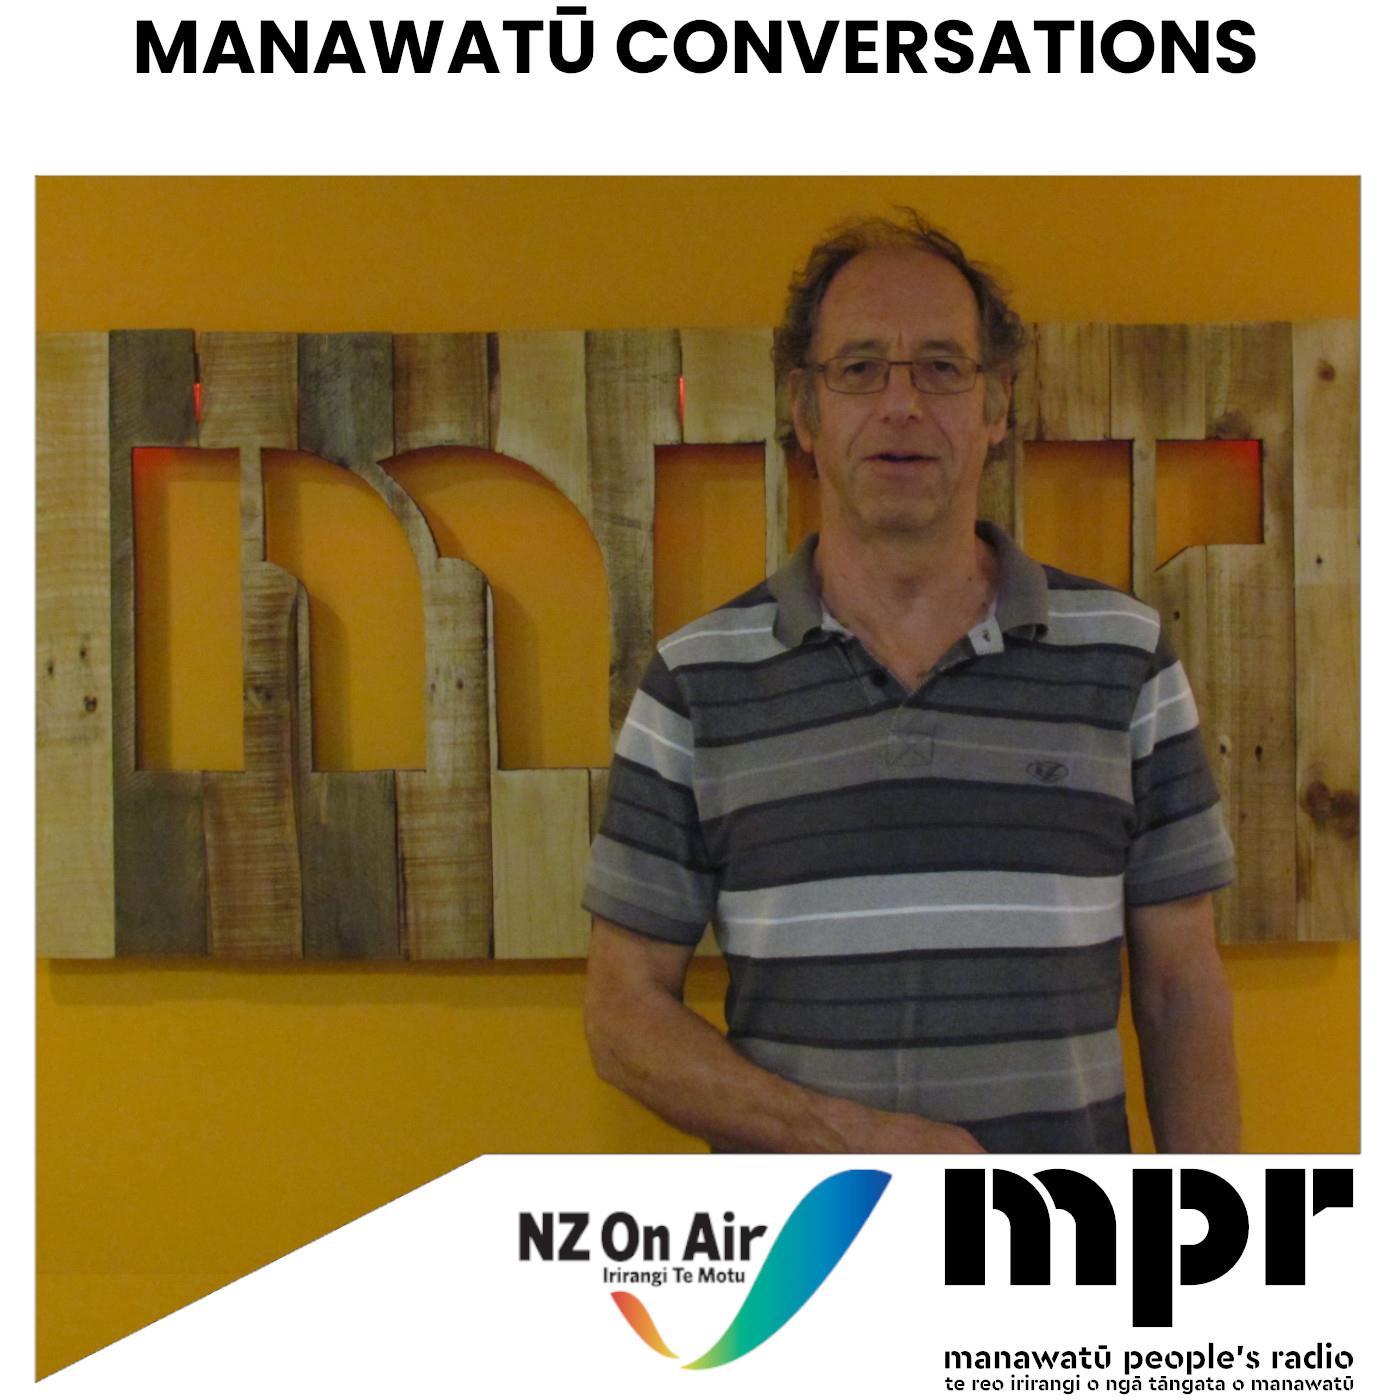 Manawatu Conversations 03-08-2021 - Episode 169